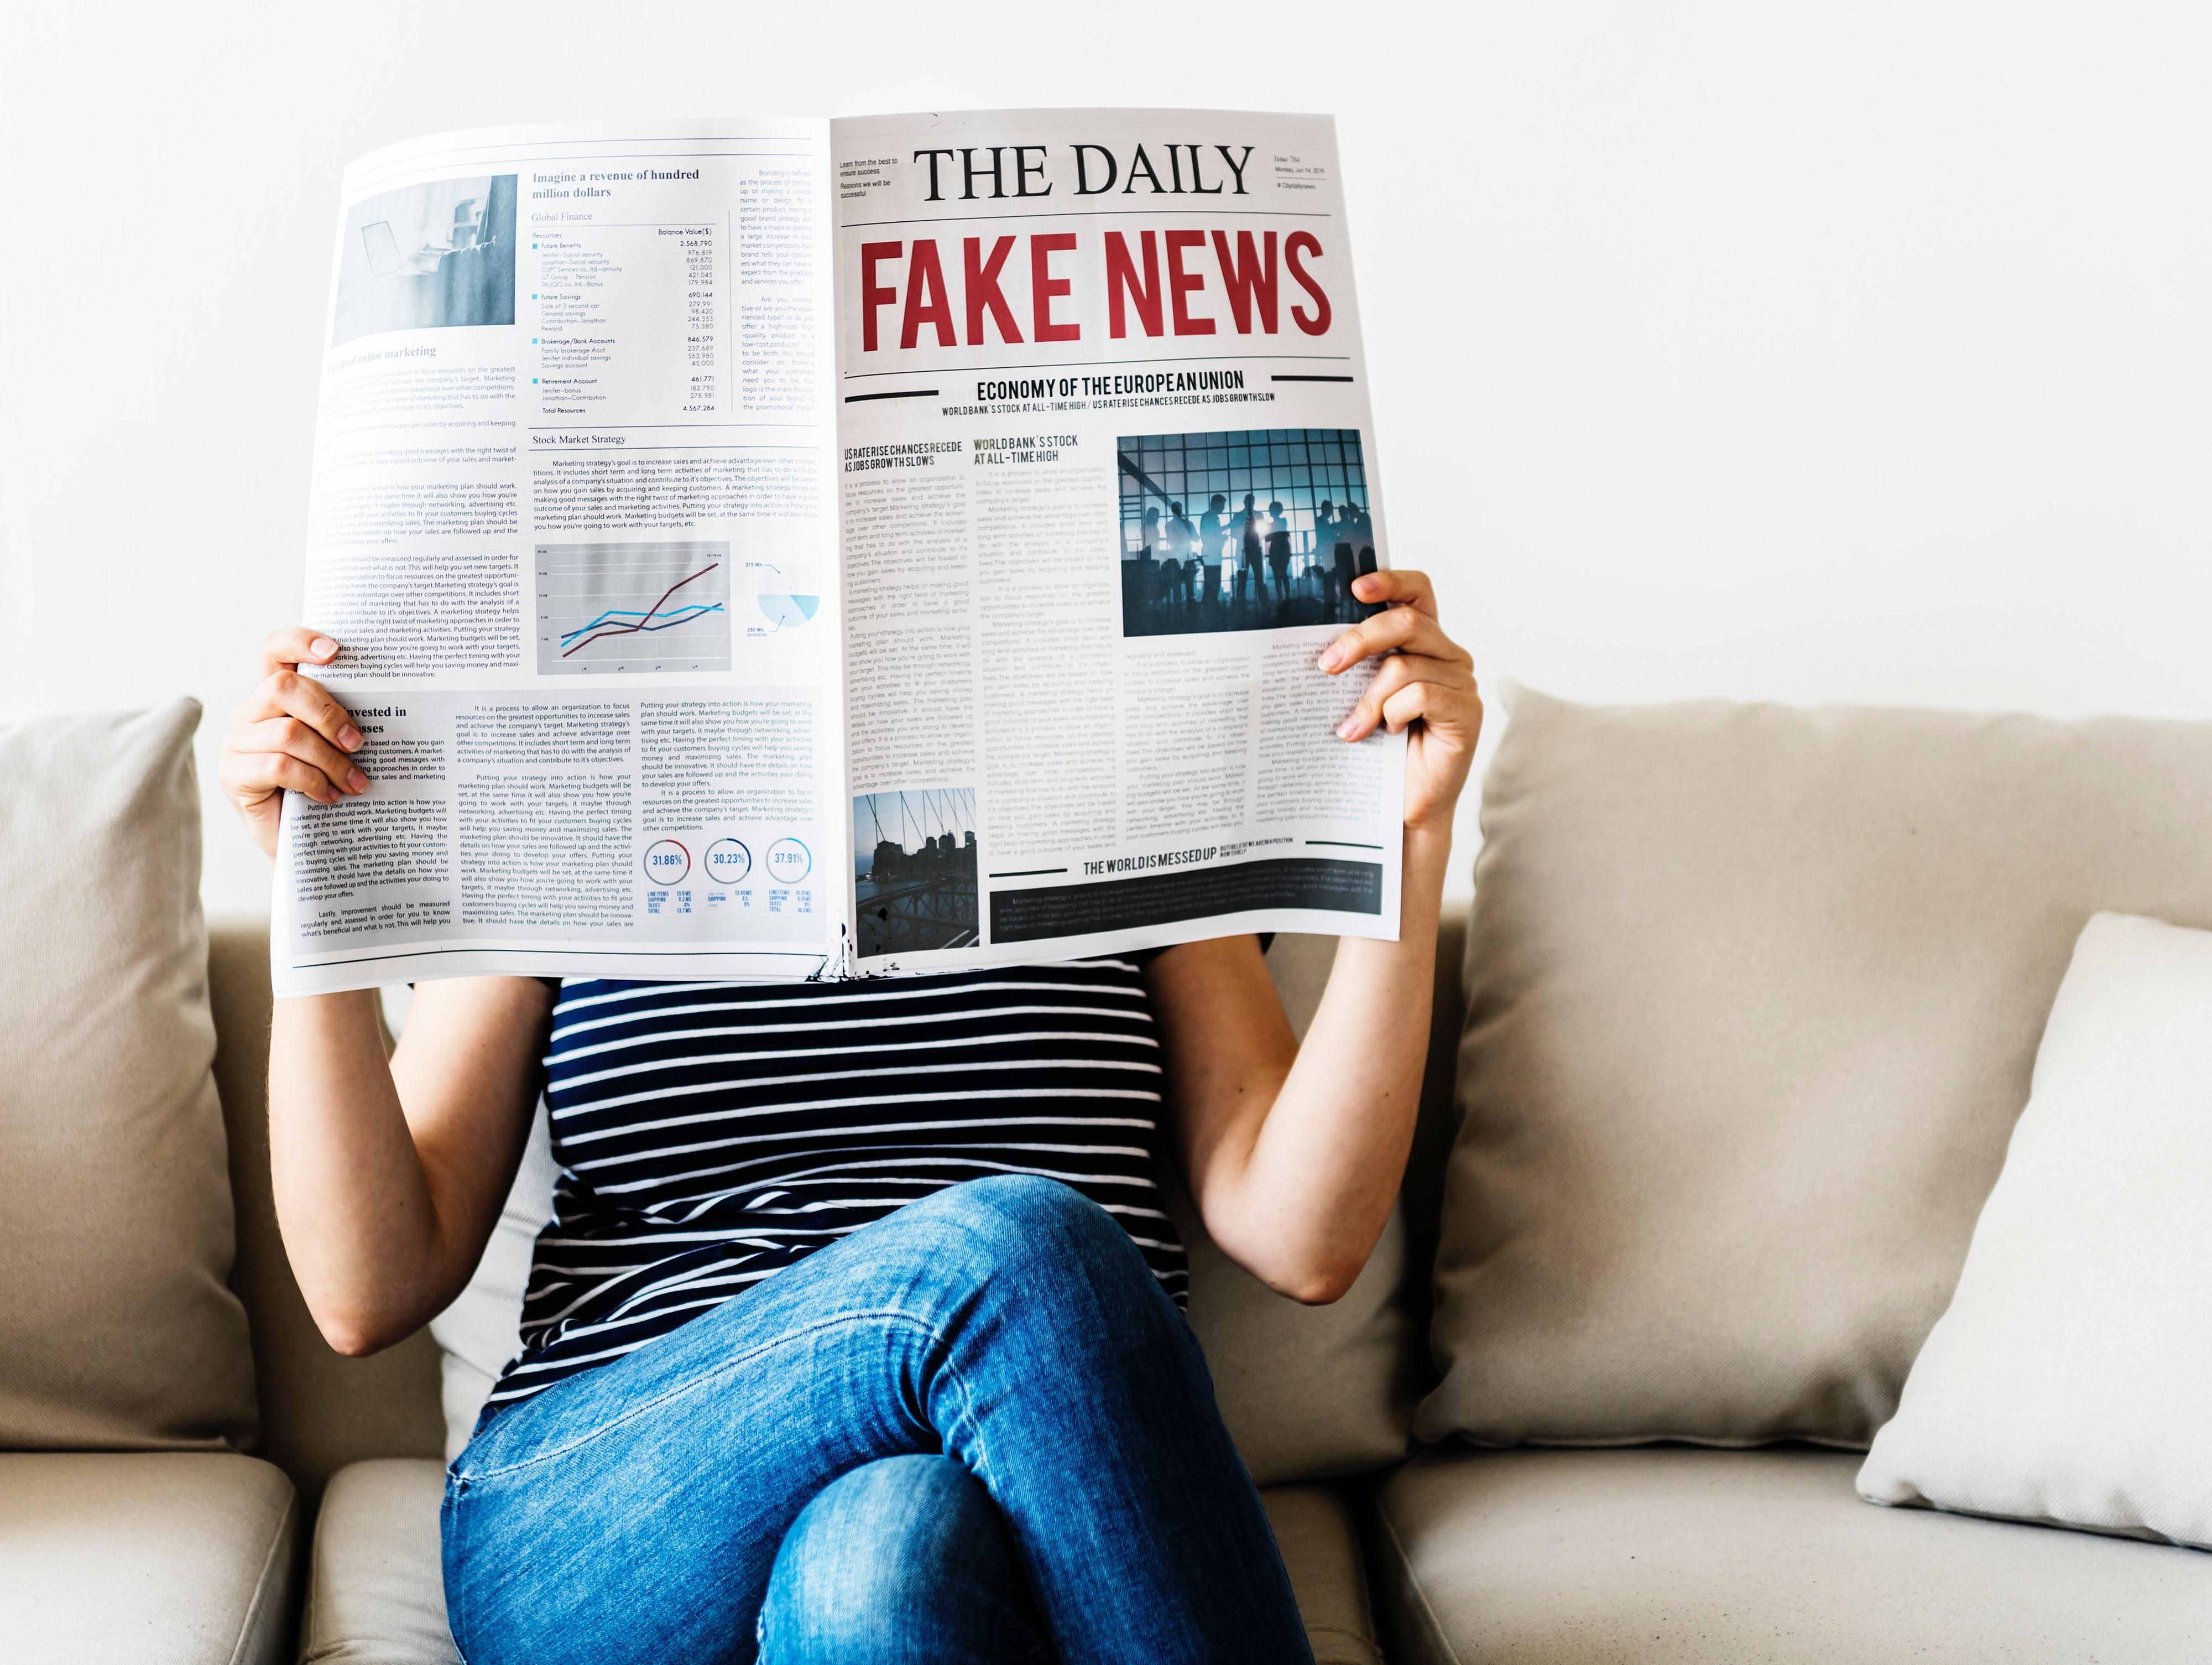 fake-news-1576181526